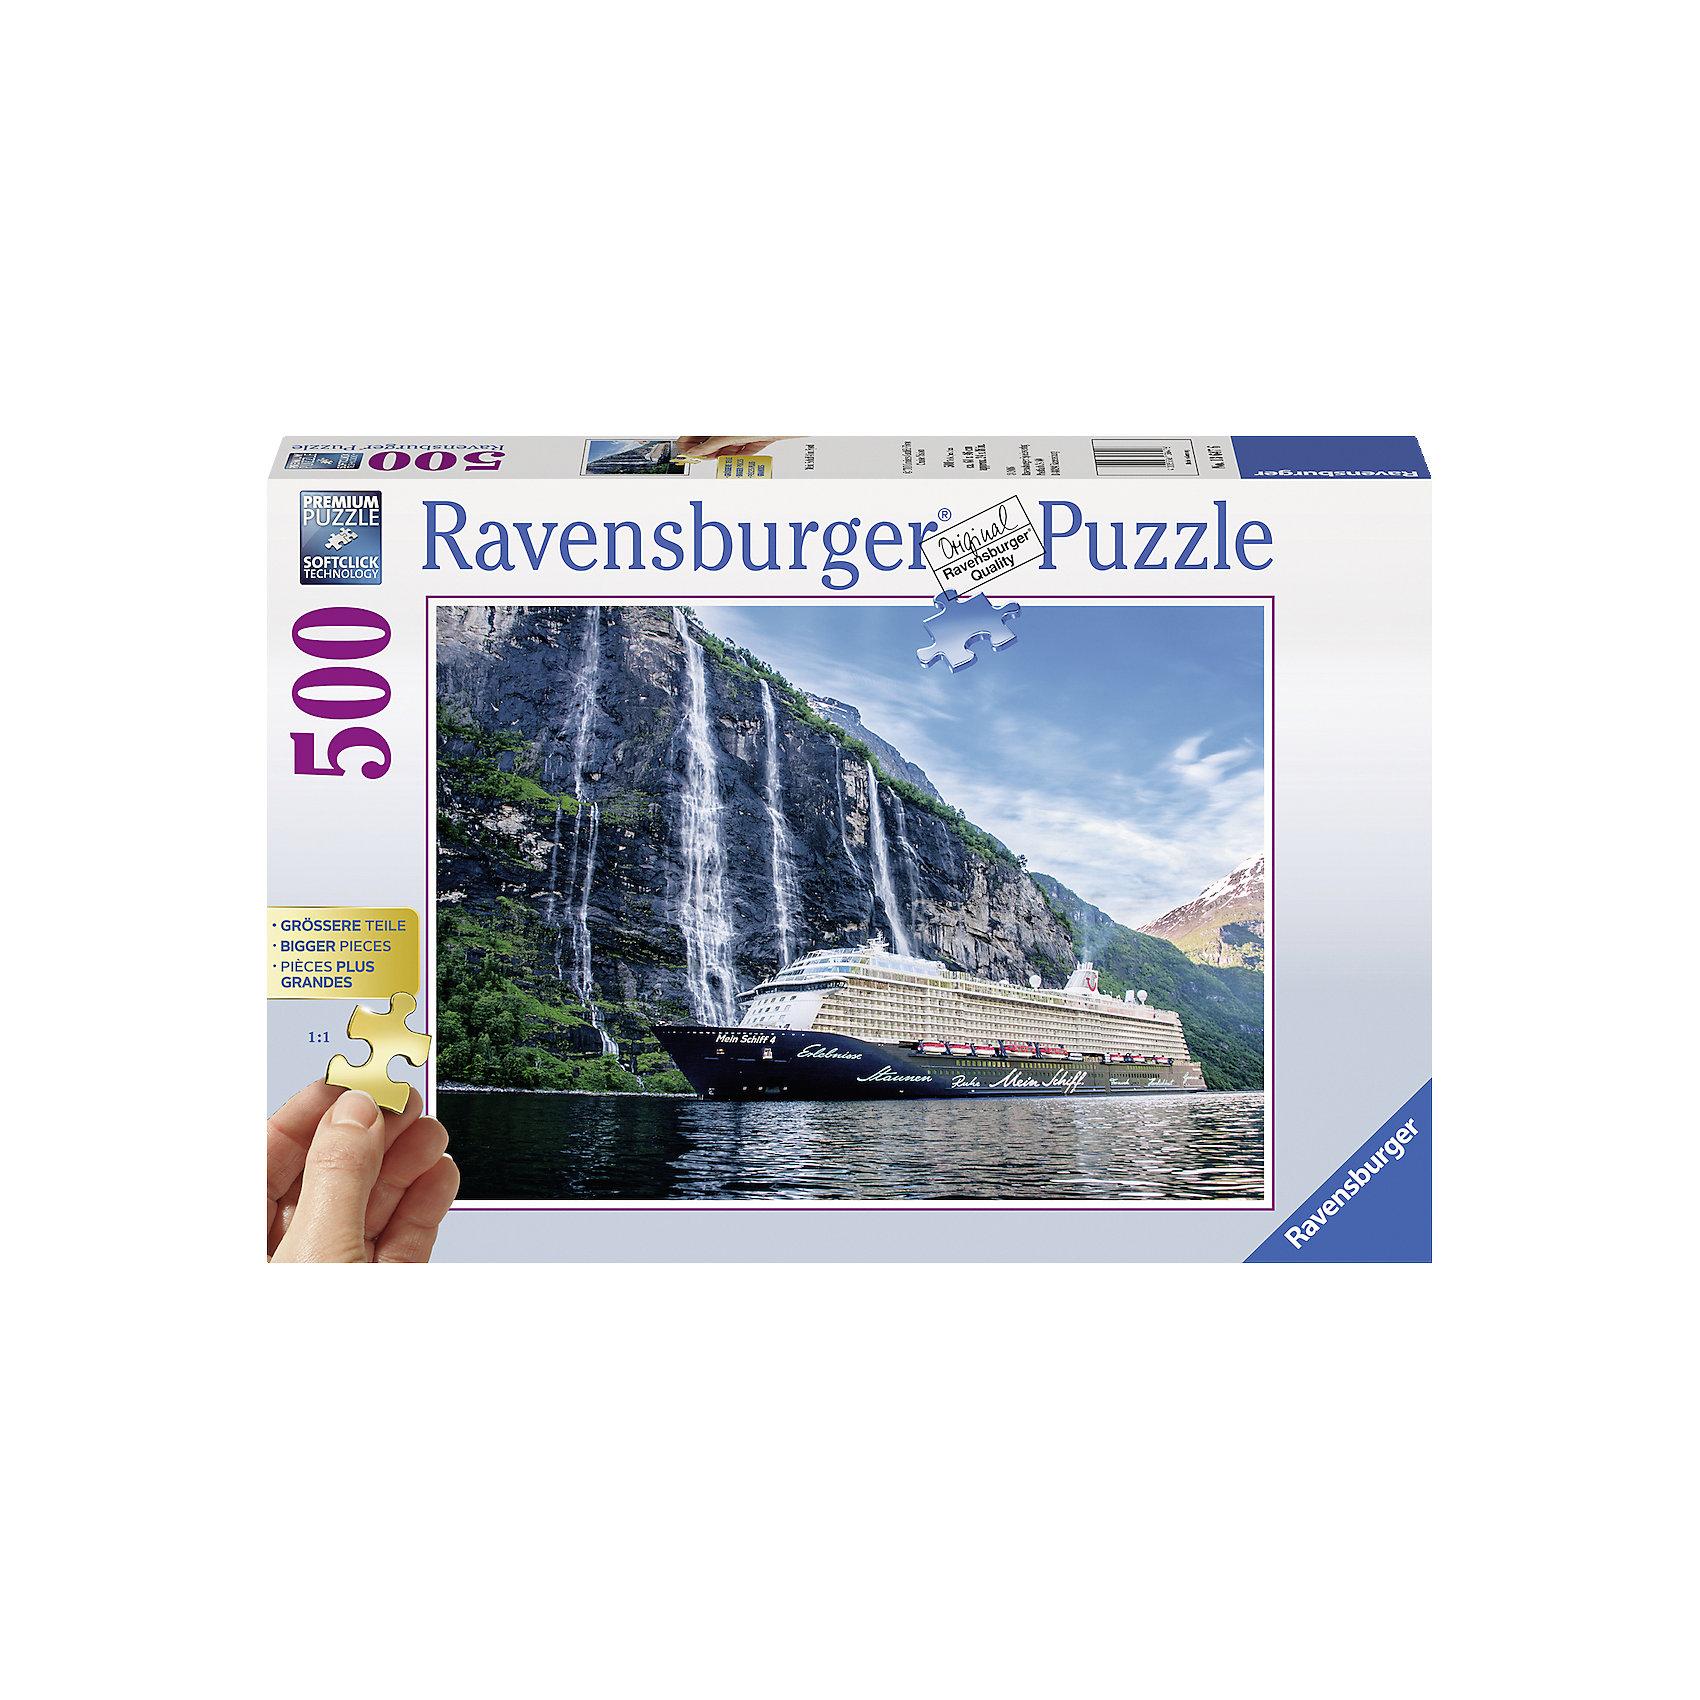 Ravensburger Пазл Мой корабль 4 во фьорде, 500 деталей, Ravensburger ravensburger пазл прима балерина 500 деталей